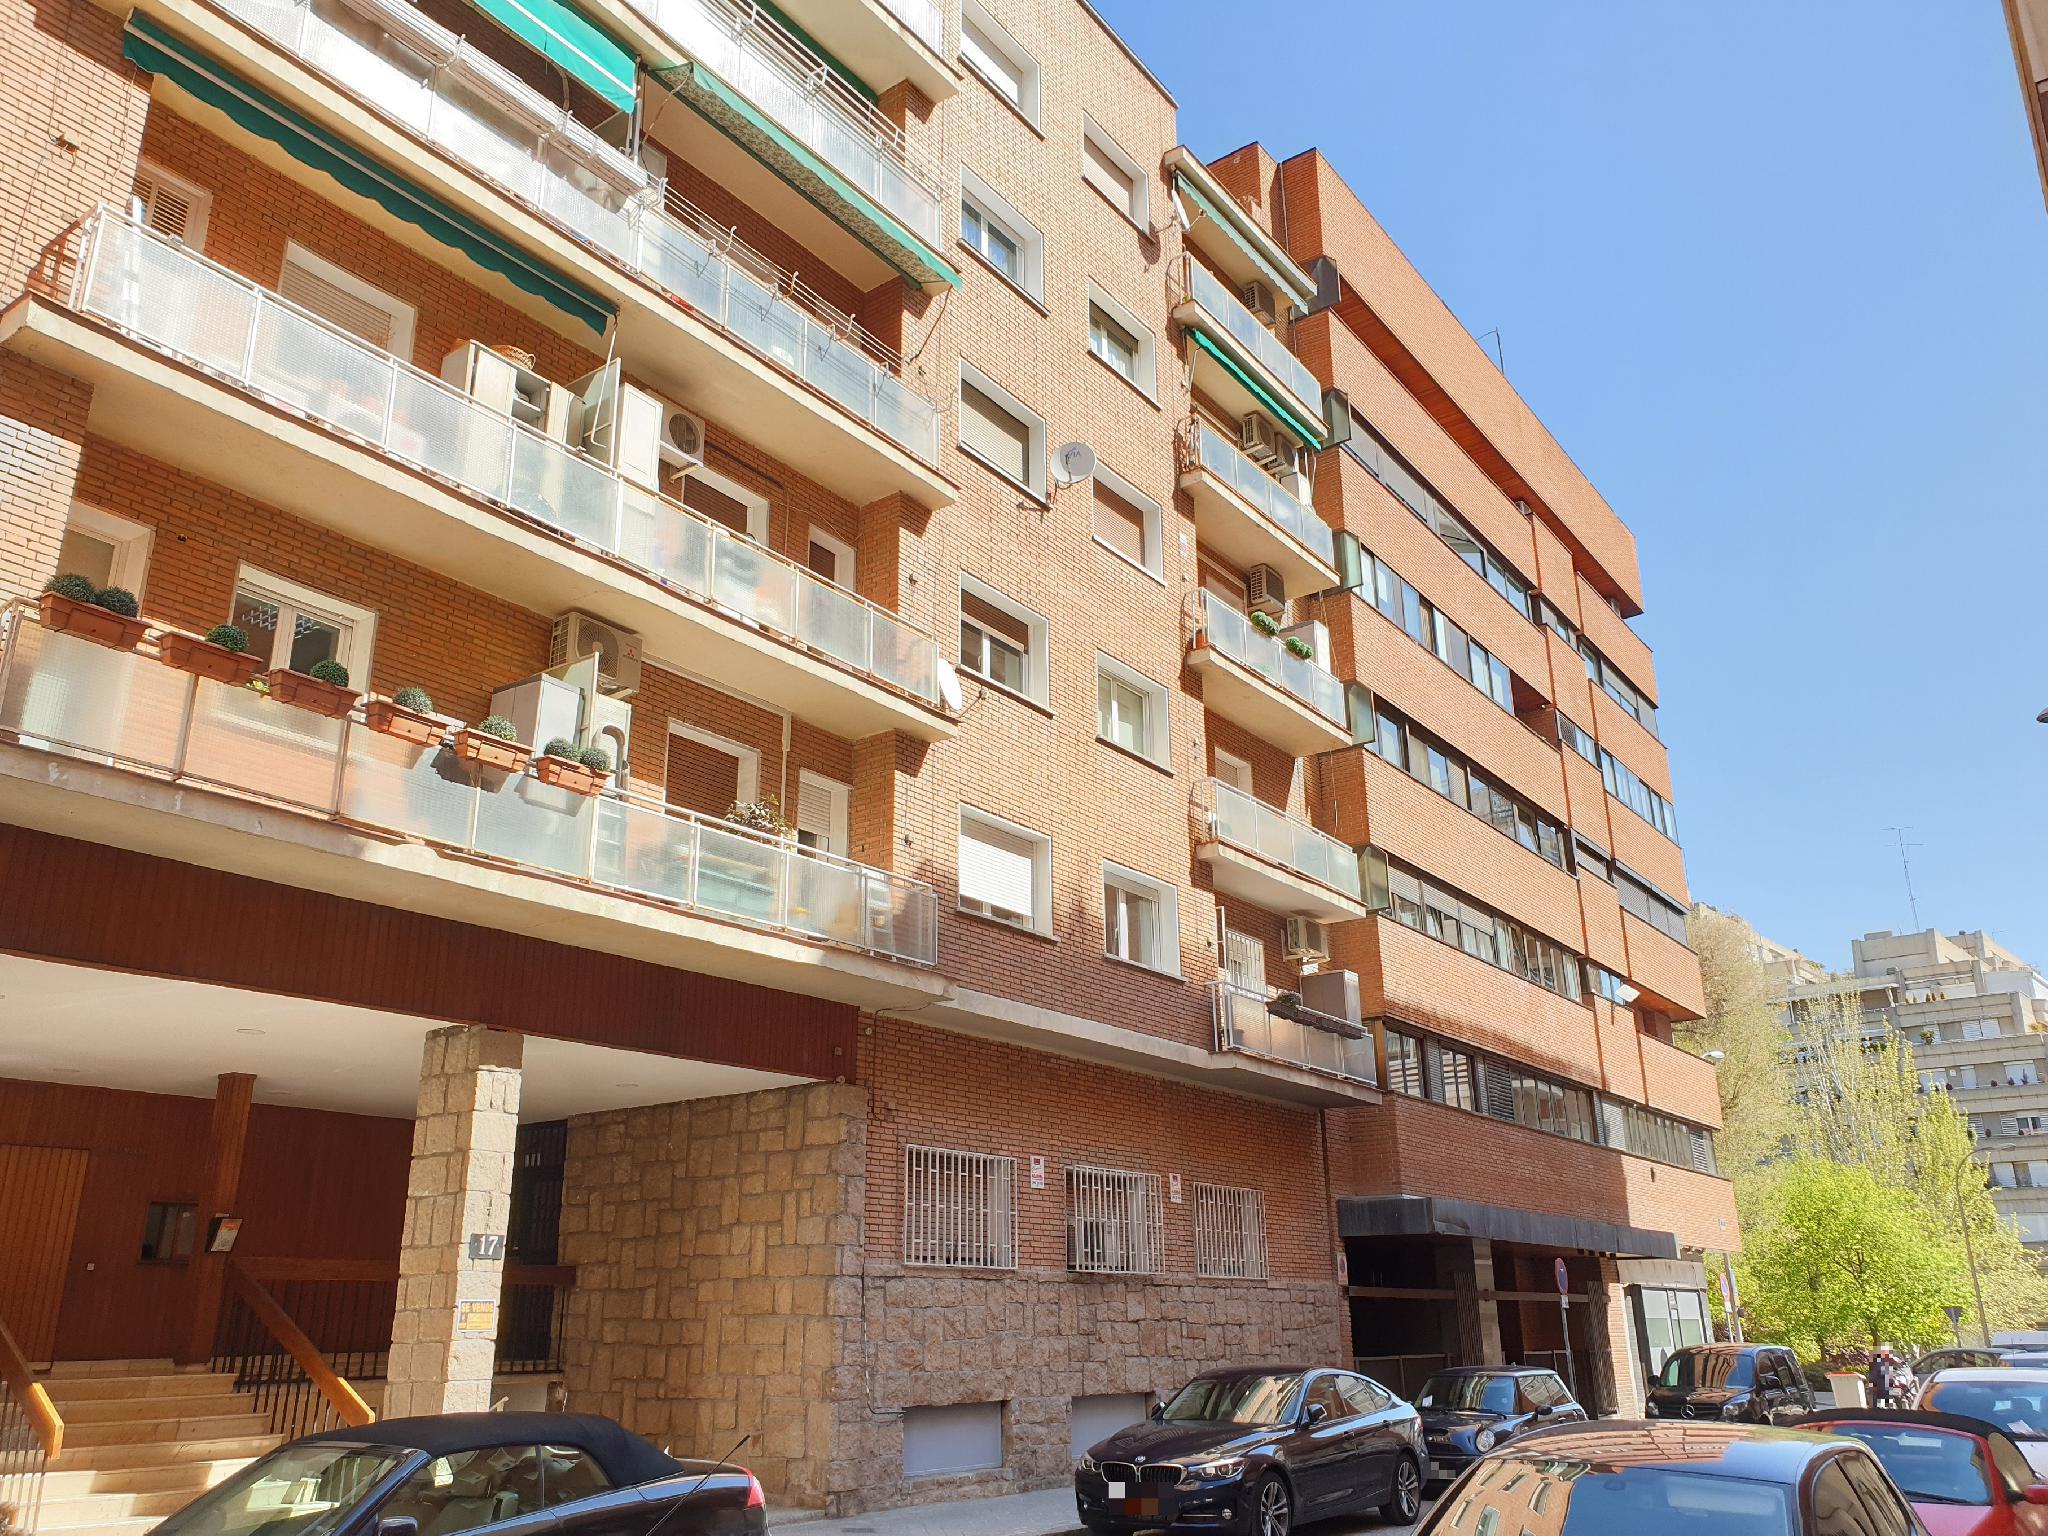 223917 - Calle Cochabamba cerca del Paseo de la Habana